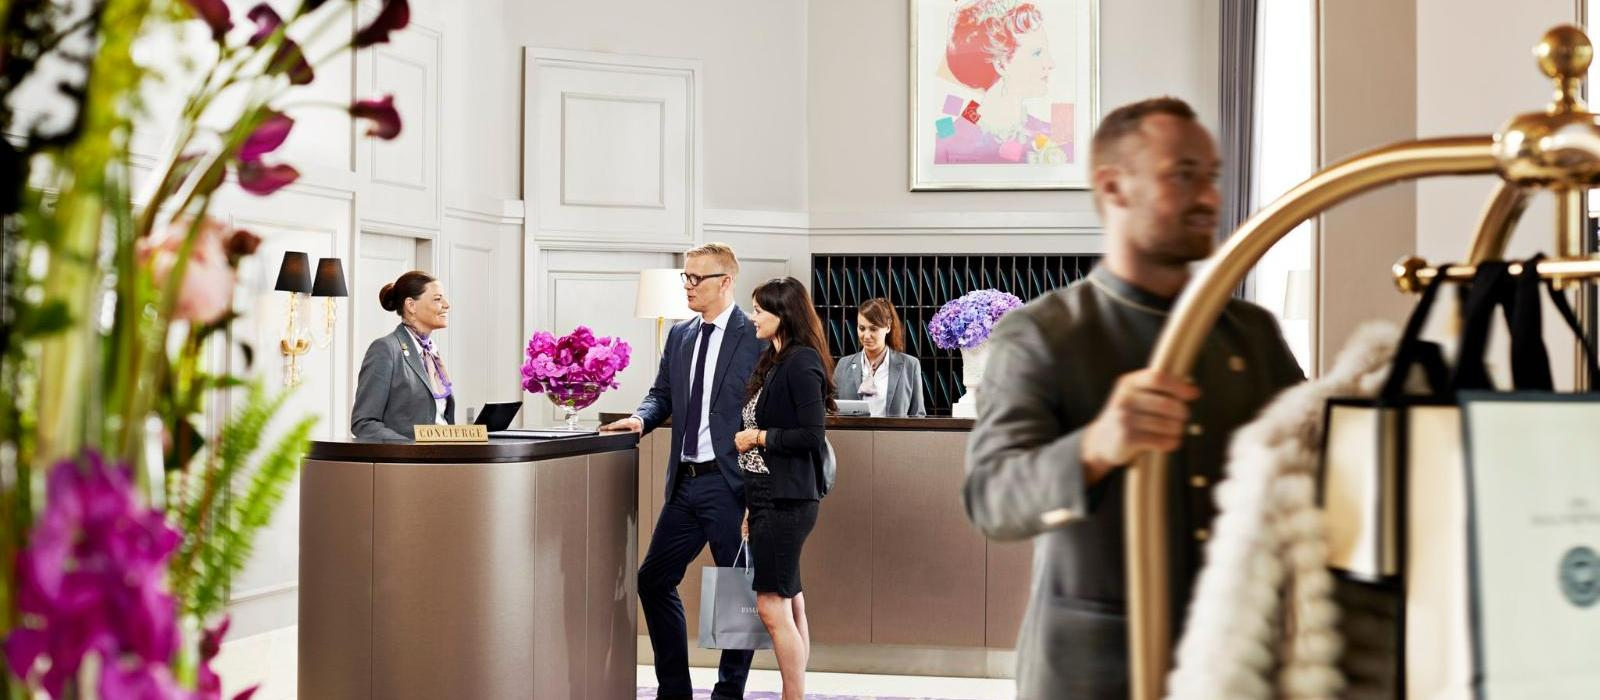 彤格乐豪华酒店(Hotel d'Angleterre) 接待处图片  www.lhw.cn